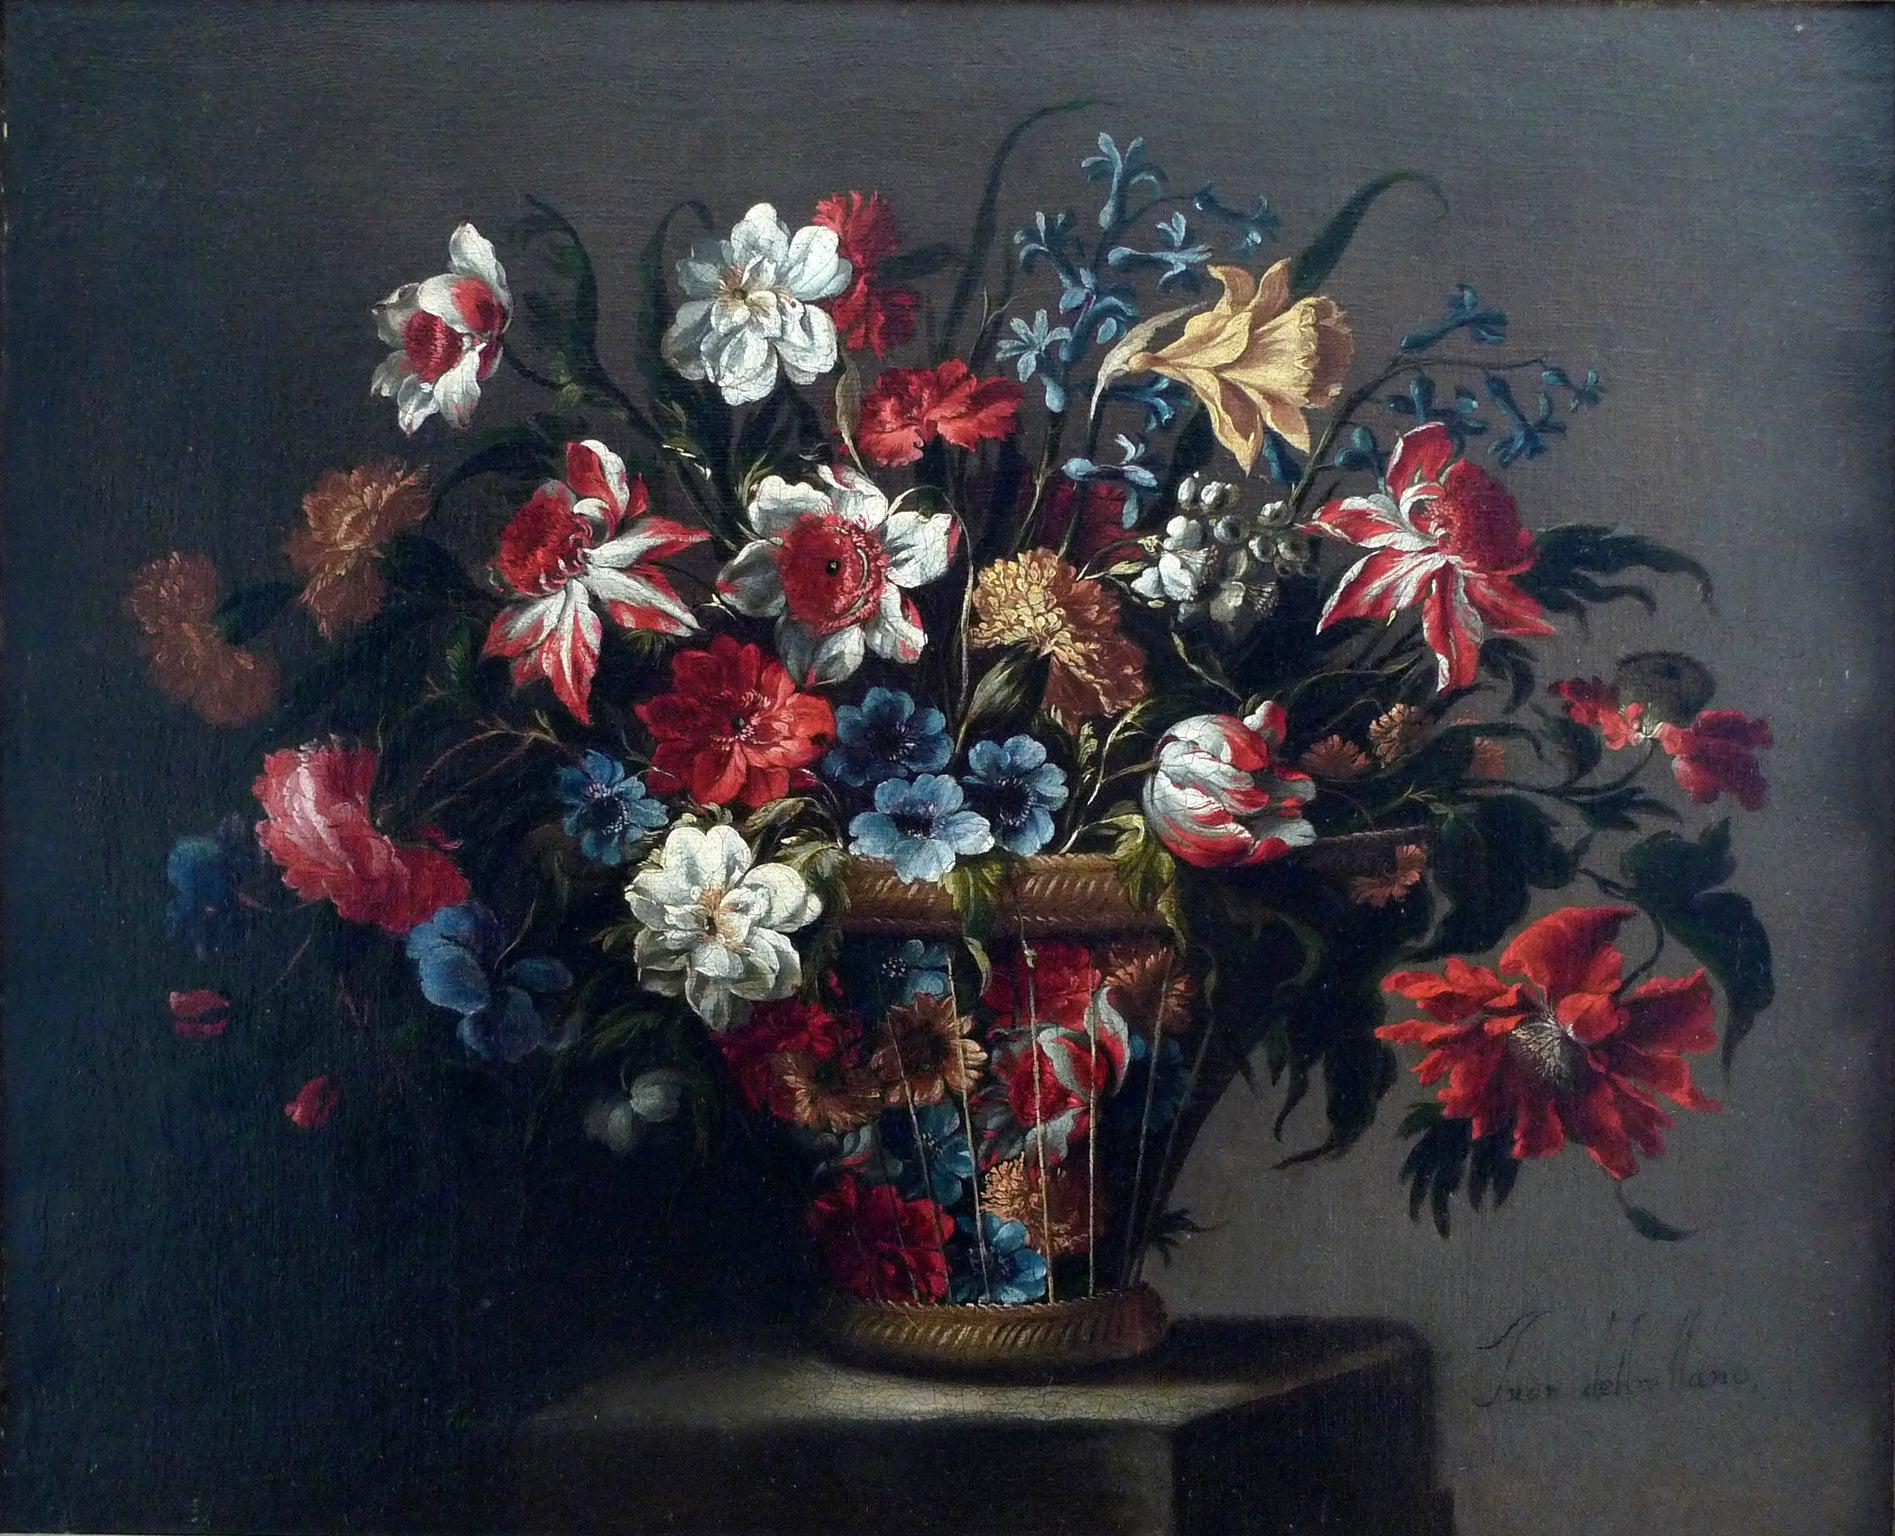 """Cesta de flores"", 17th Century oil on canvas, still flowers by Juan de Arellano"